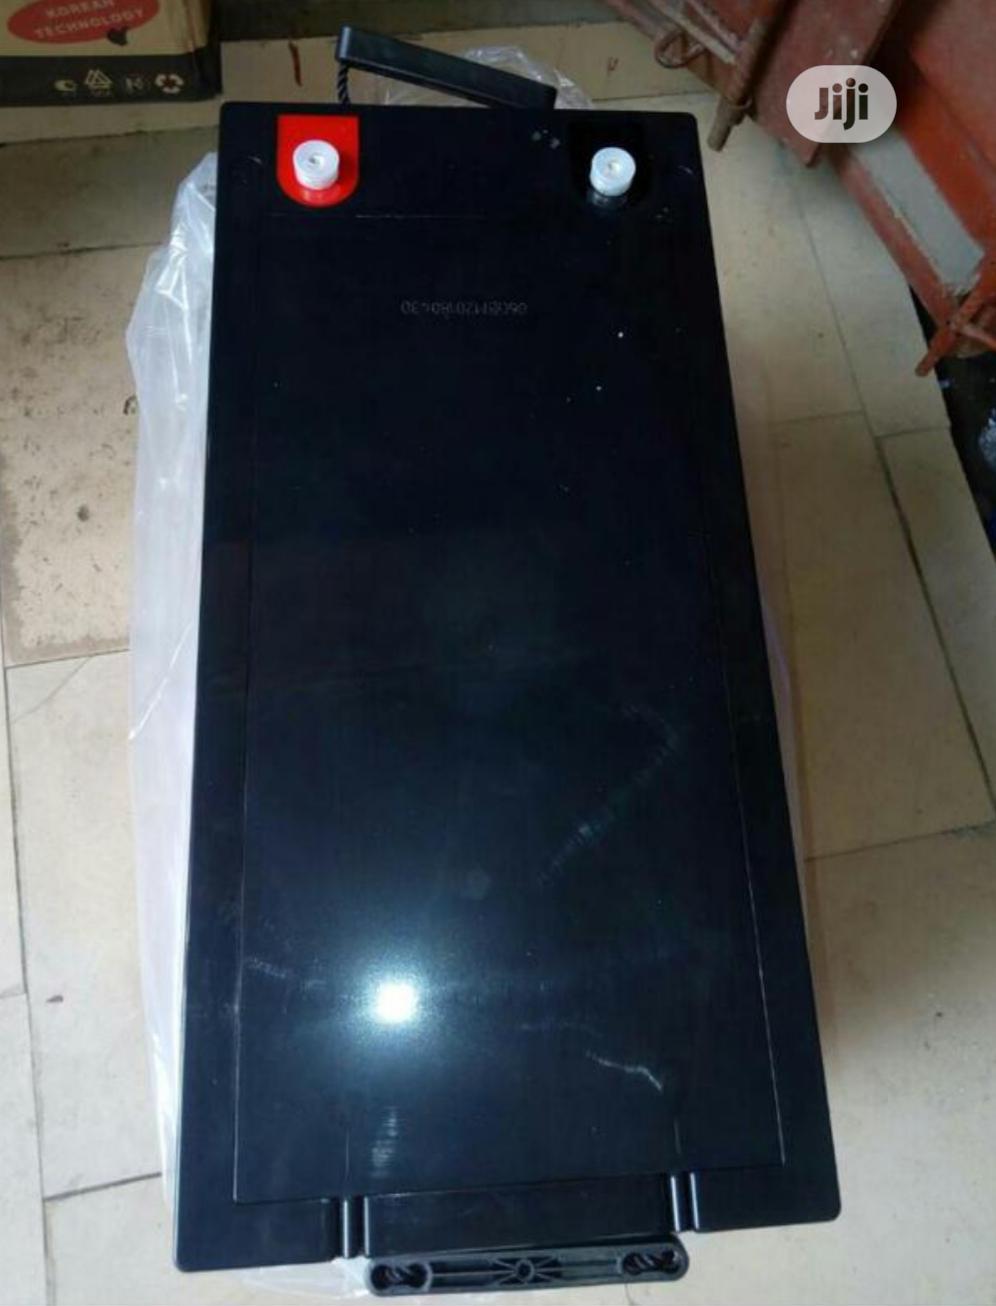 GBM 200ah 12v Batterys